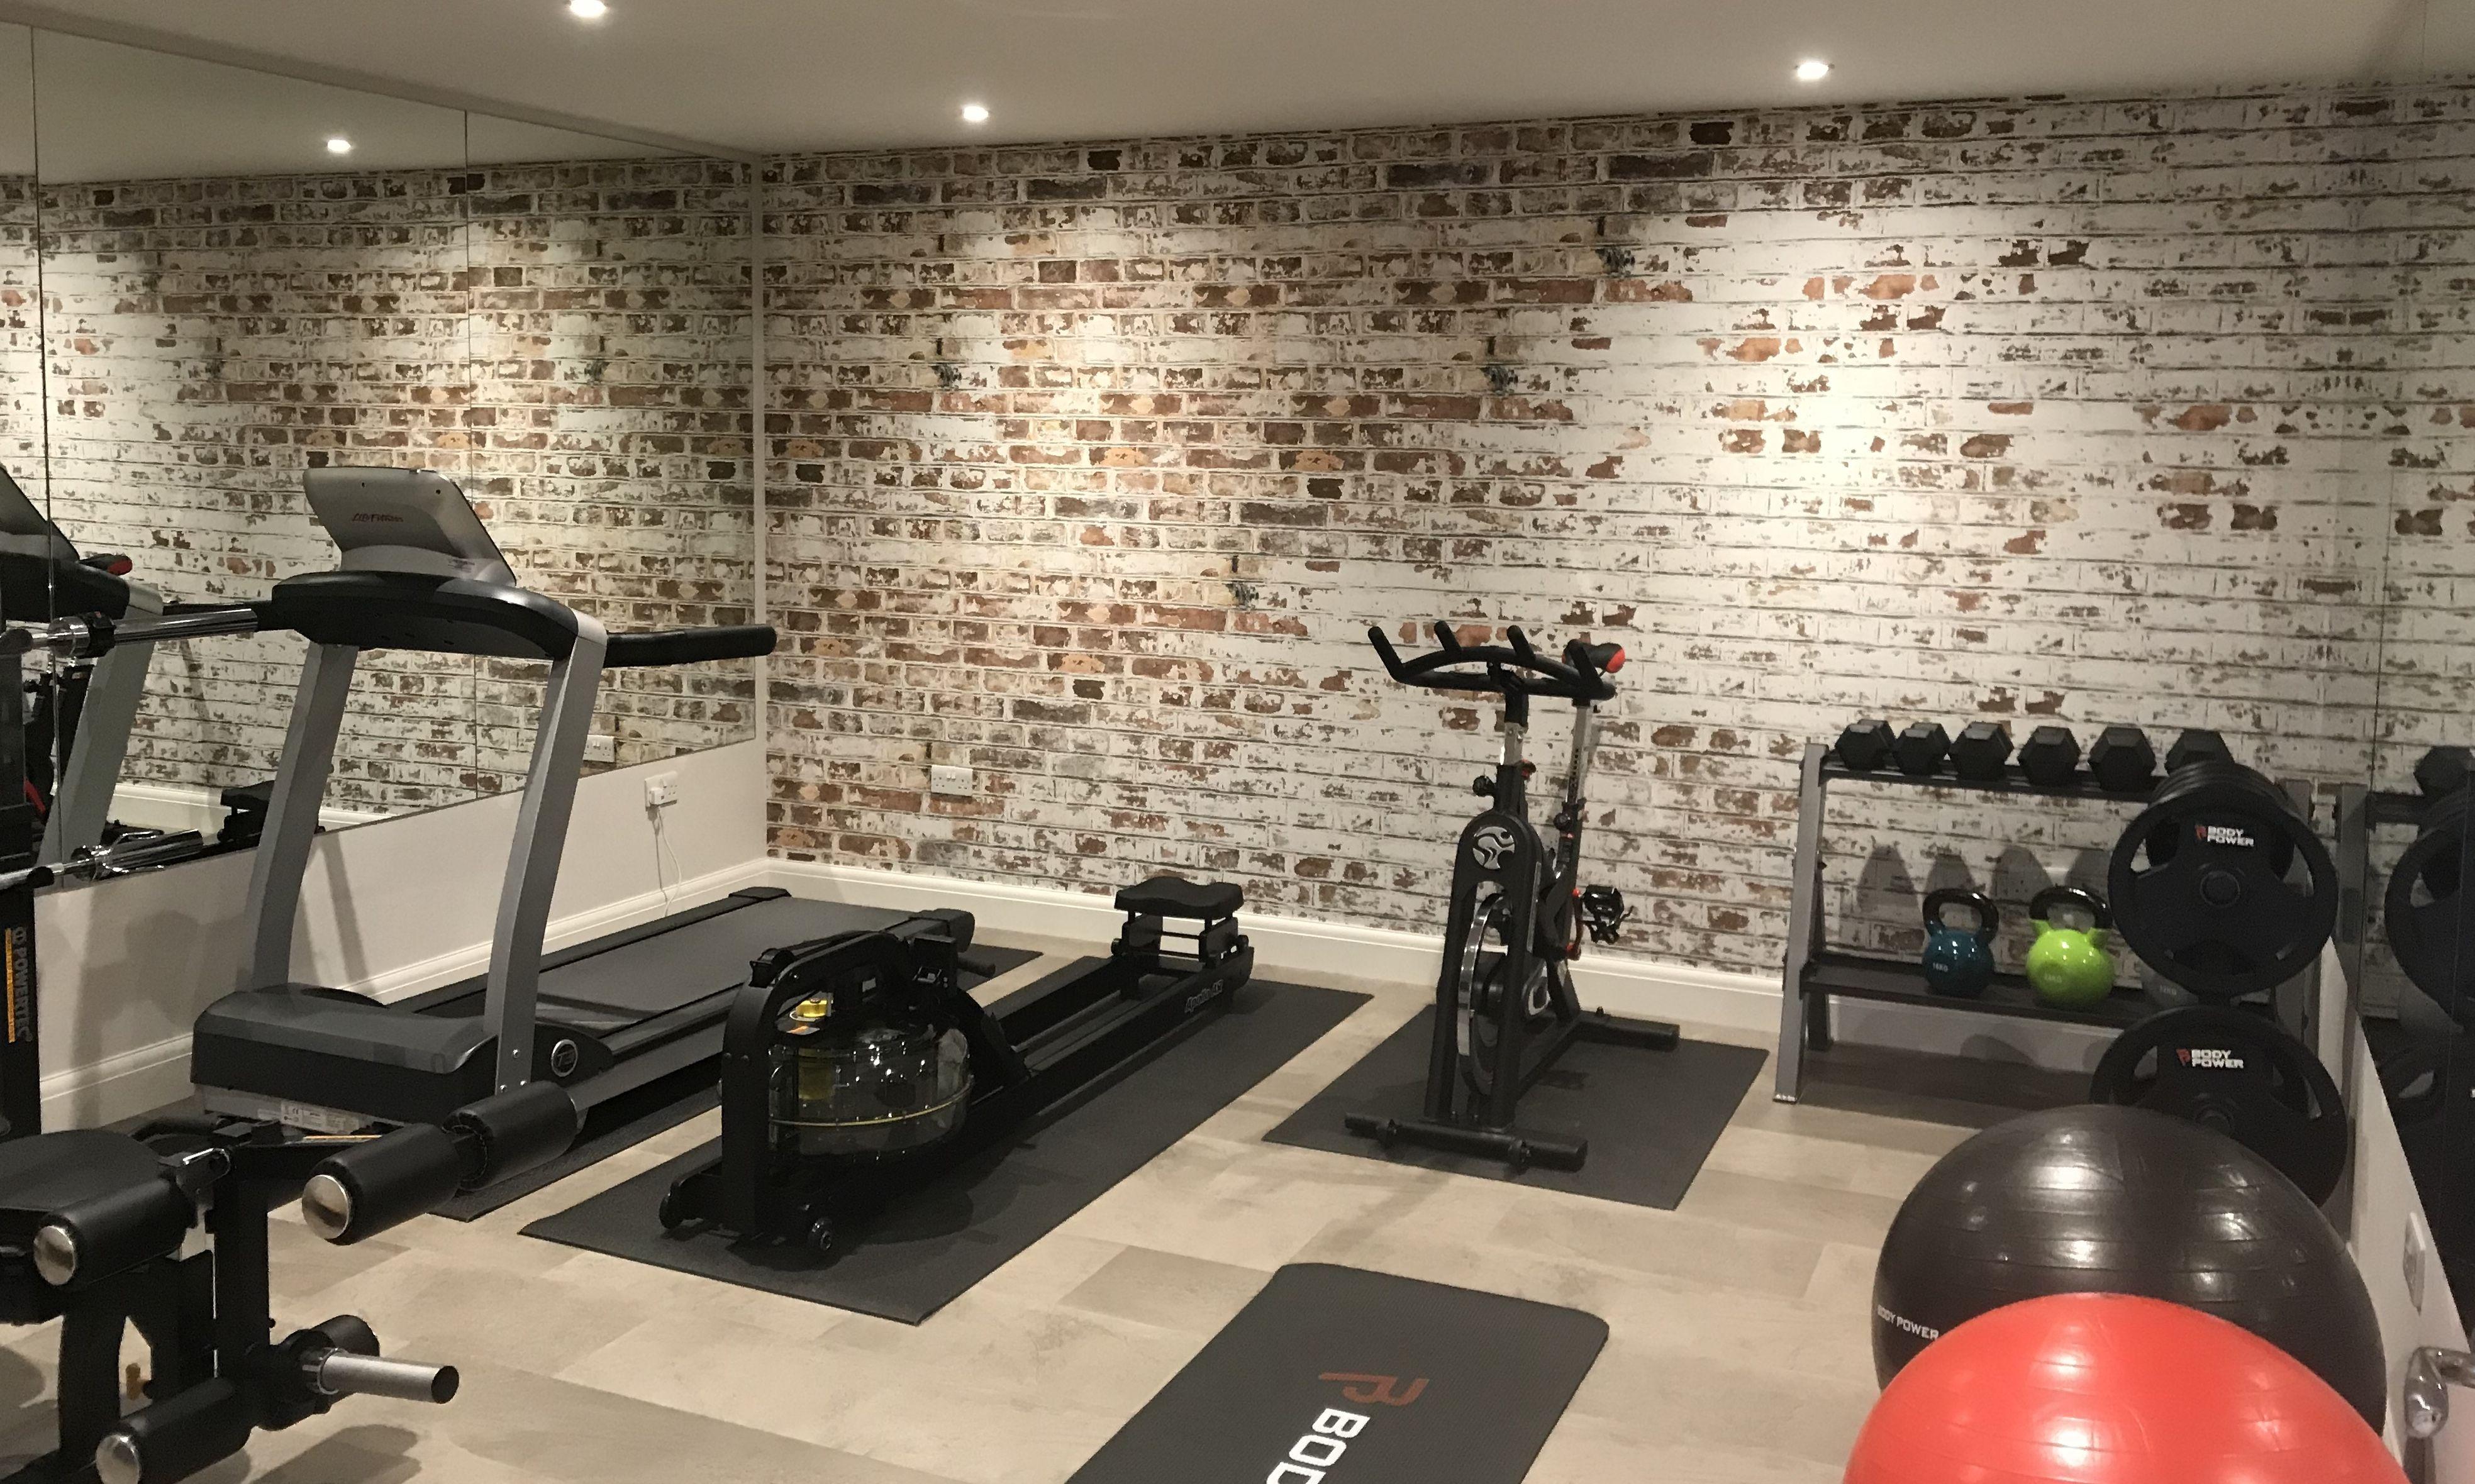 White Painted Brick Wallpaper Mural | Murals Wallpaper -   19 fitness Room mall ideas